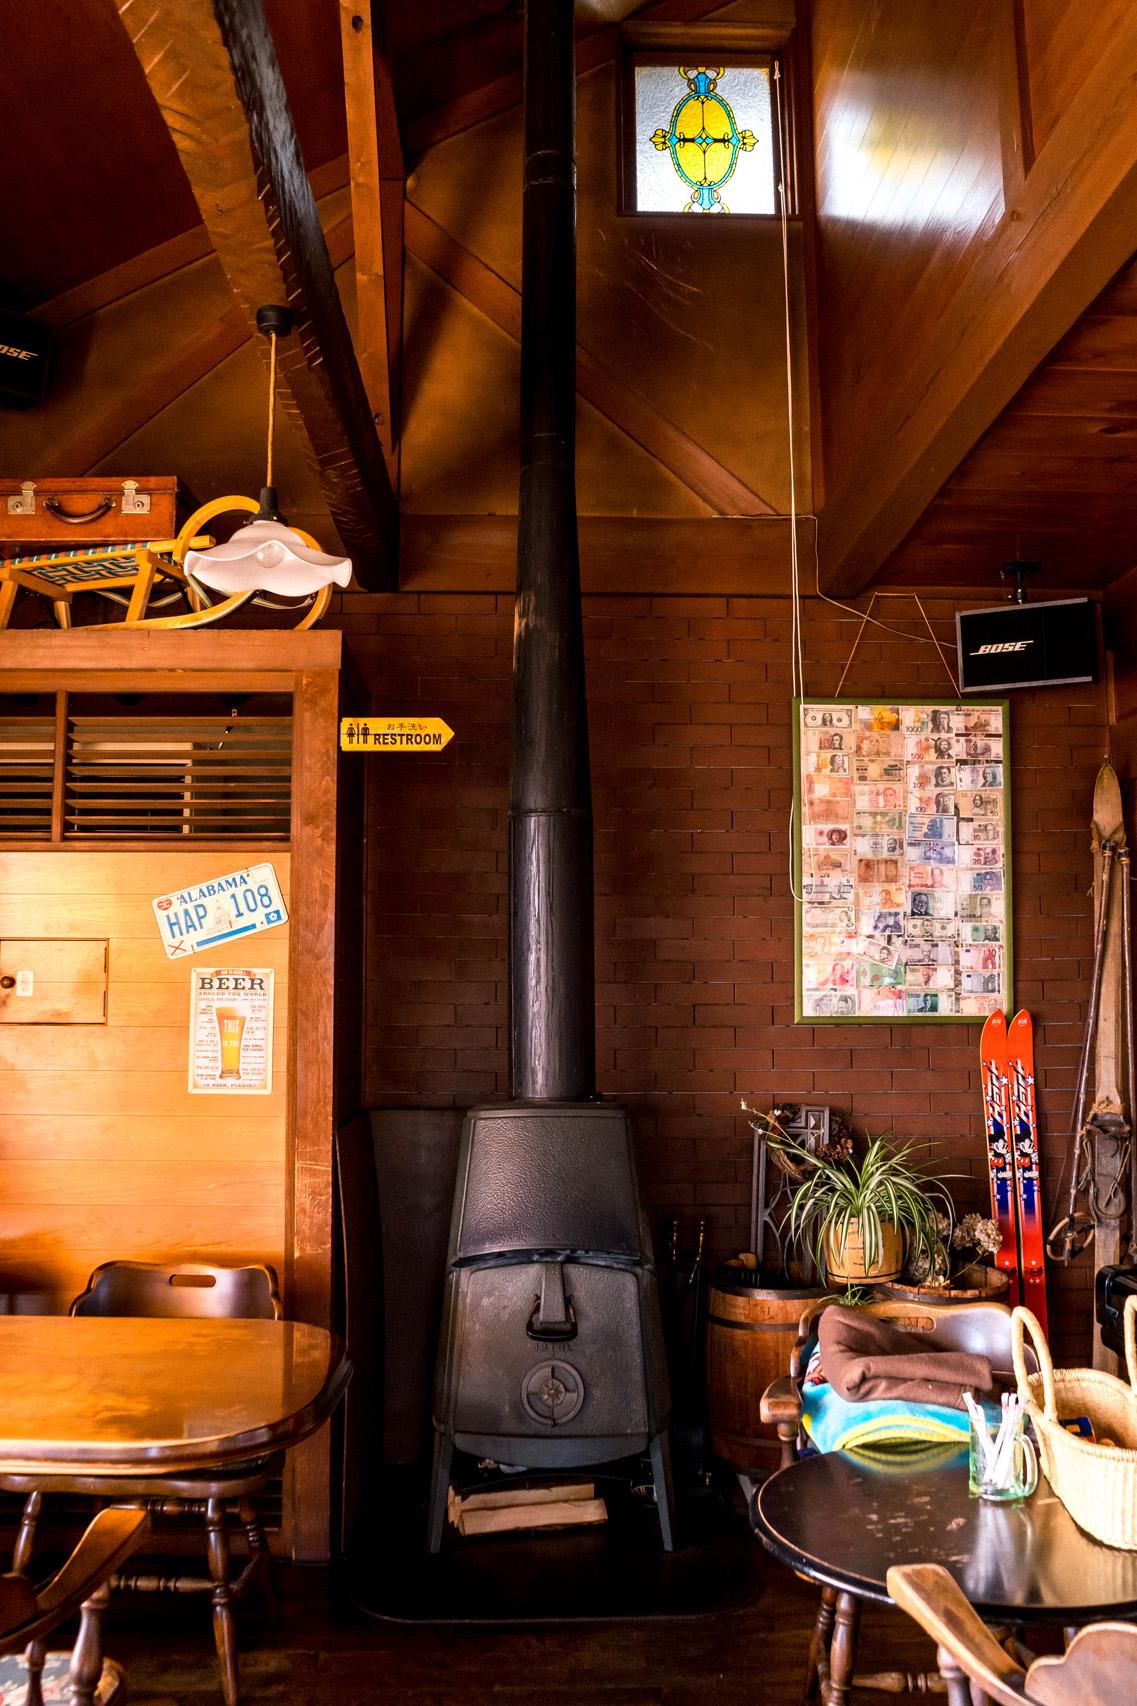 Interior of Ichii cafe, Takayama